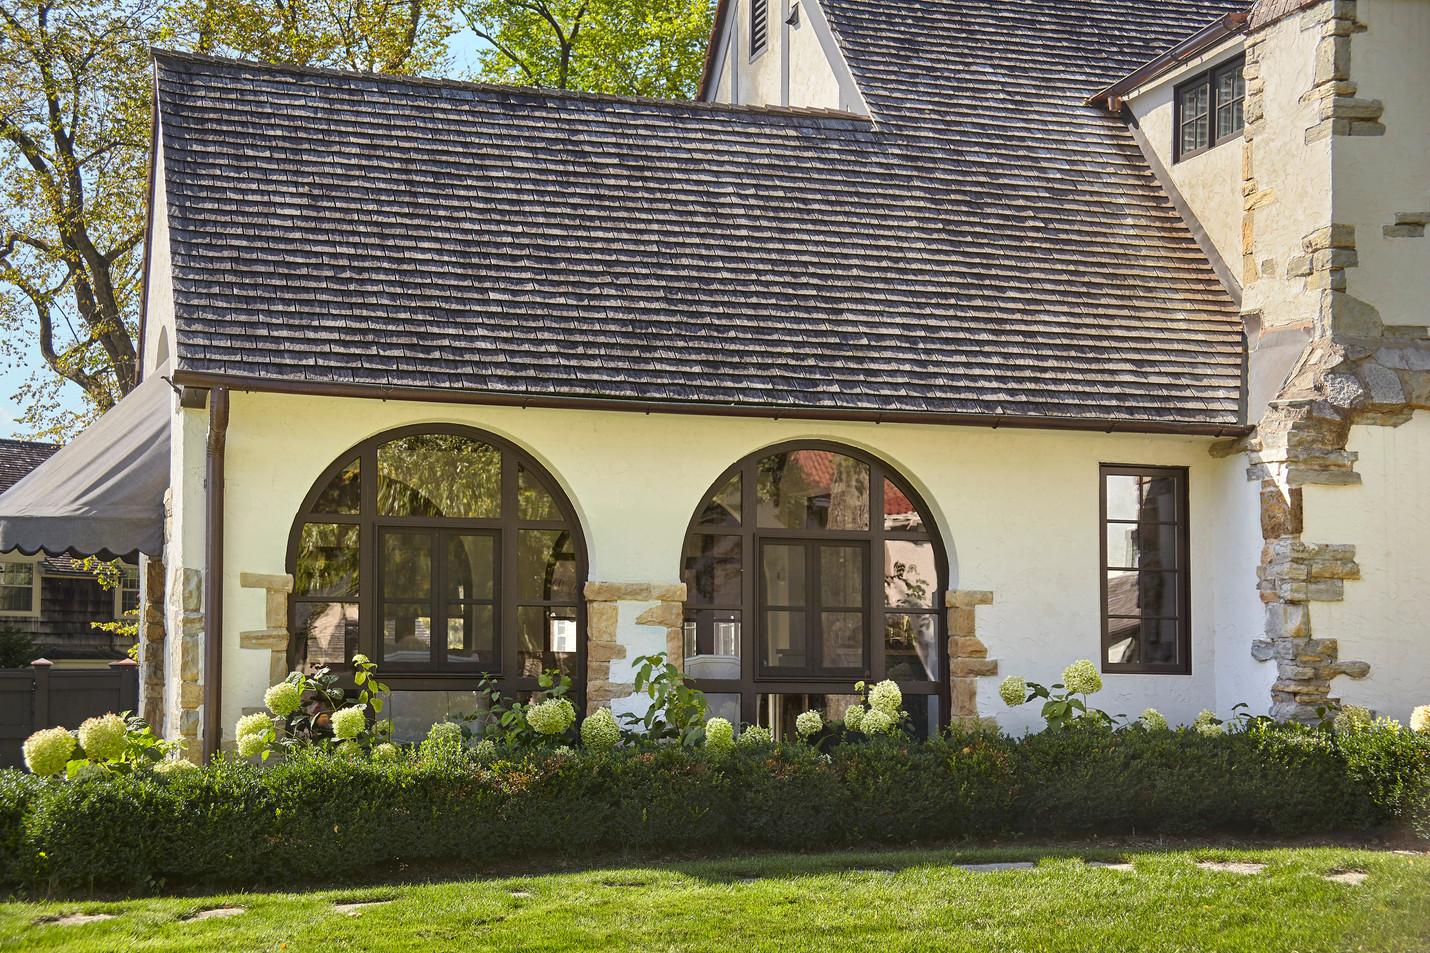 T_4632_porch windows.jpg